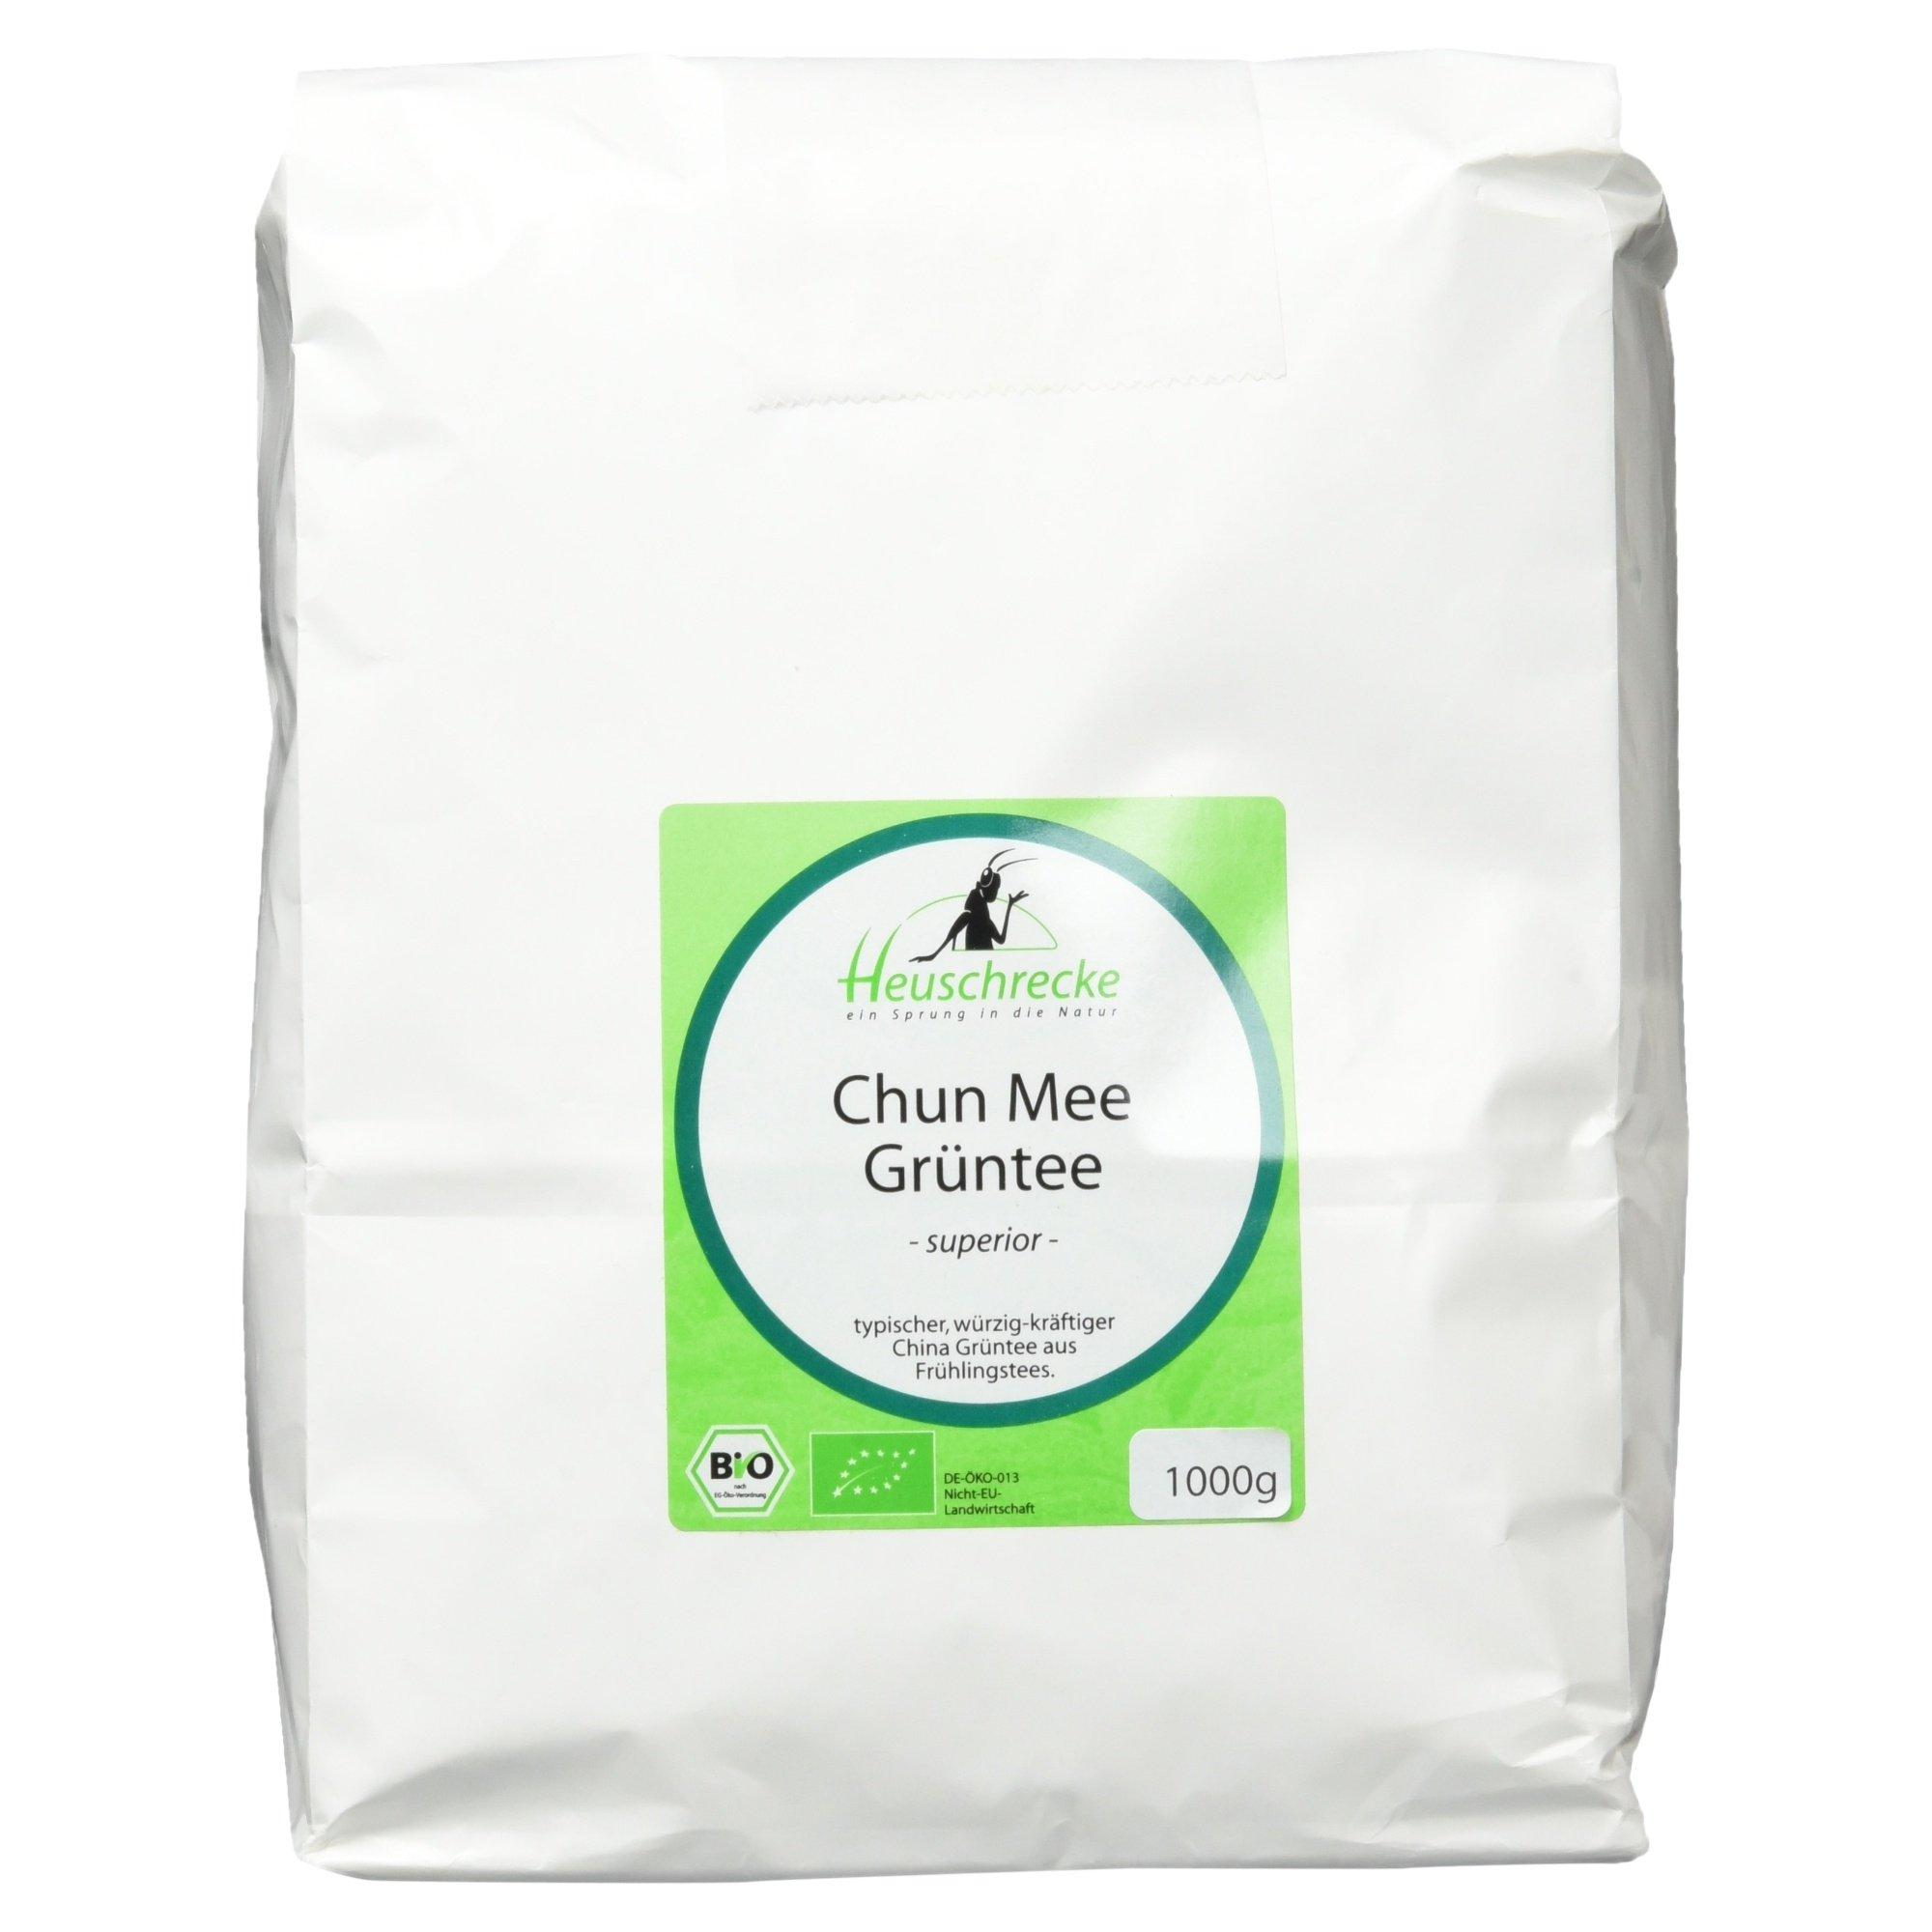 Heuschrecke-Bio-Chun-Mee-Grntee-1-kg